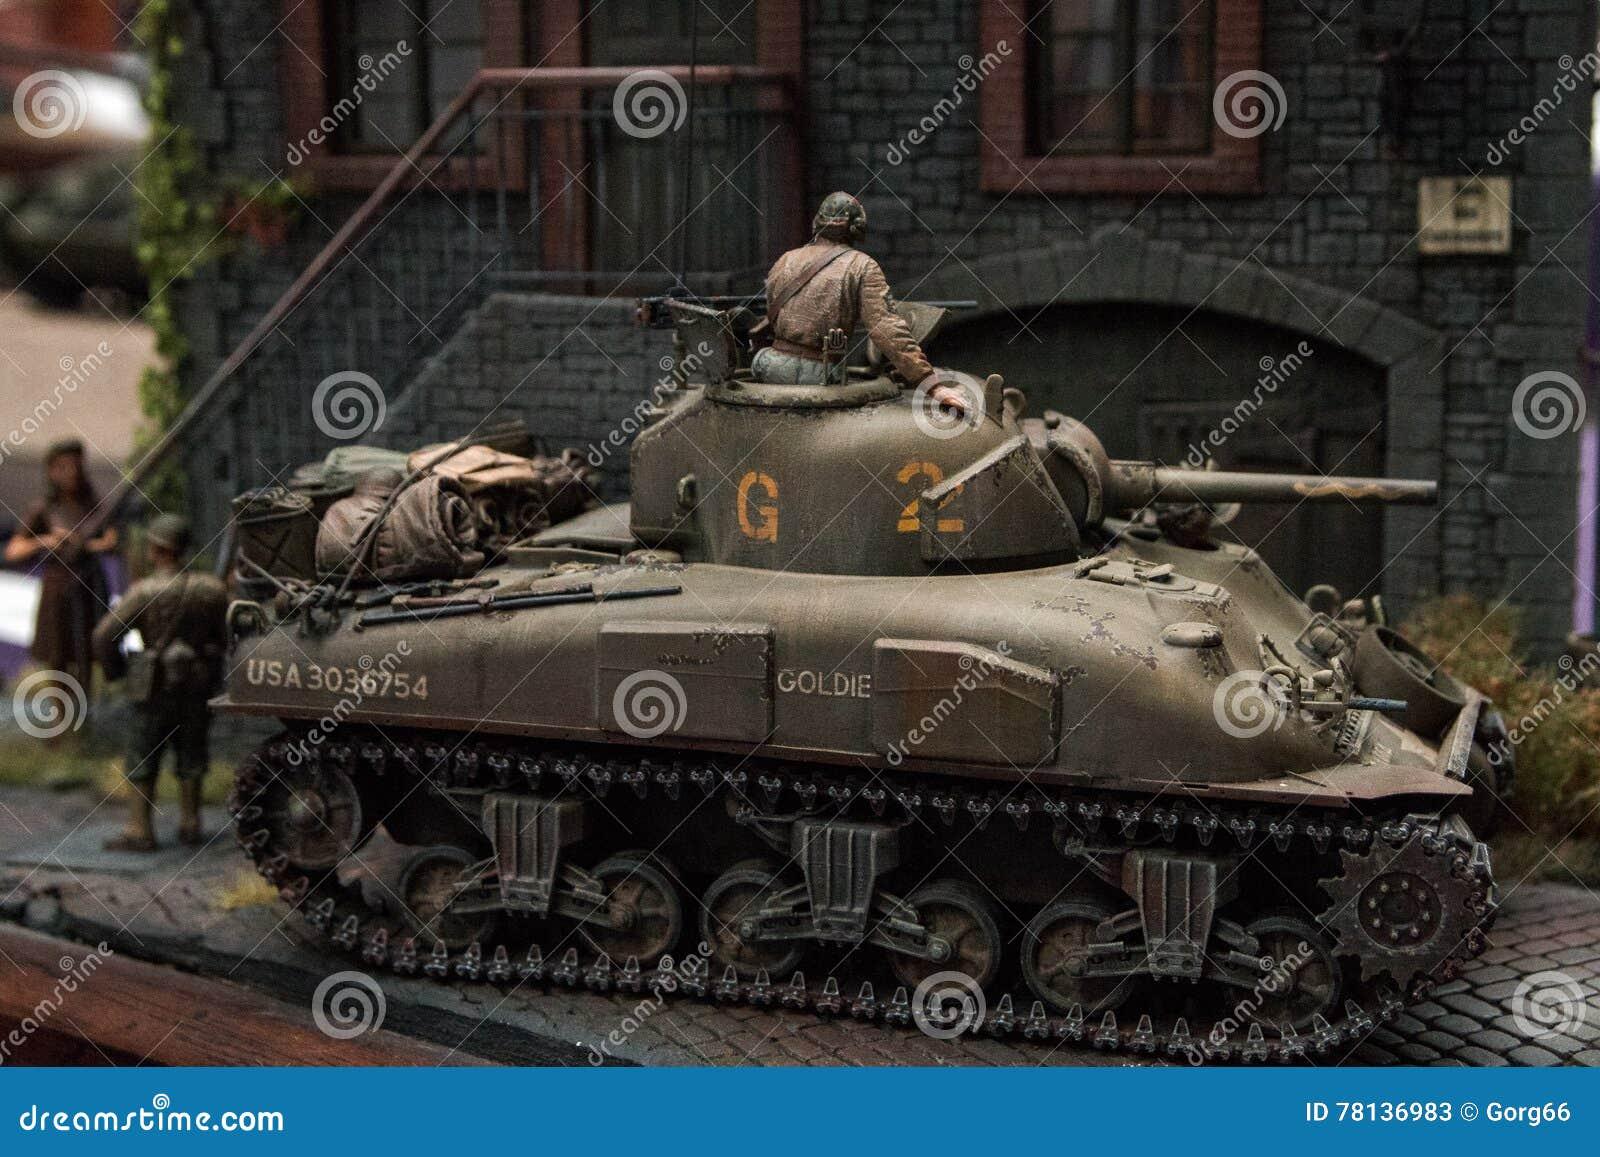 Plastic model tank stock image  Image of model, hand - 78136983